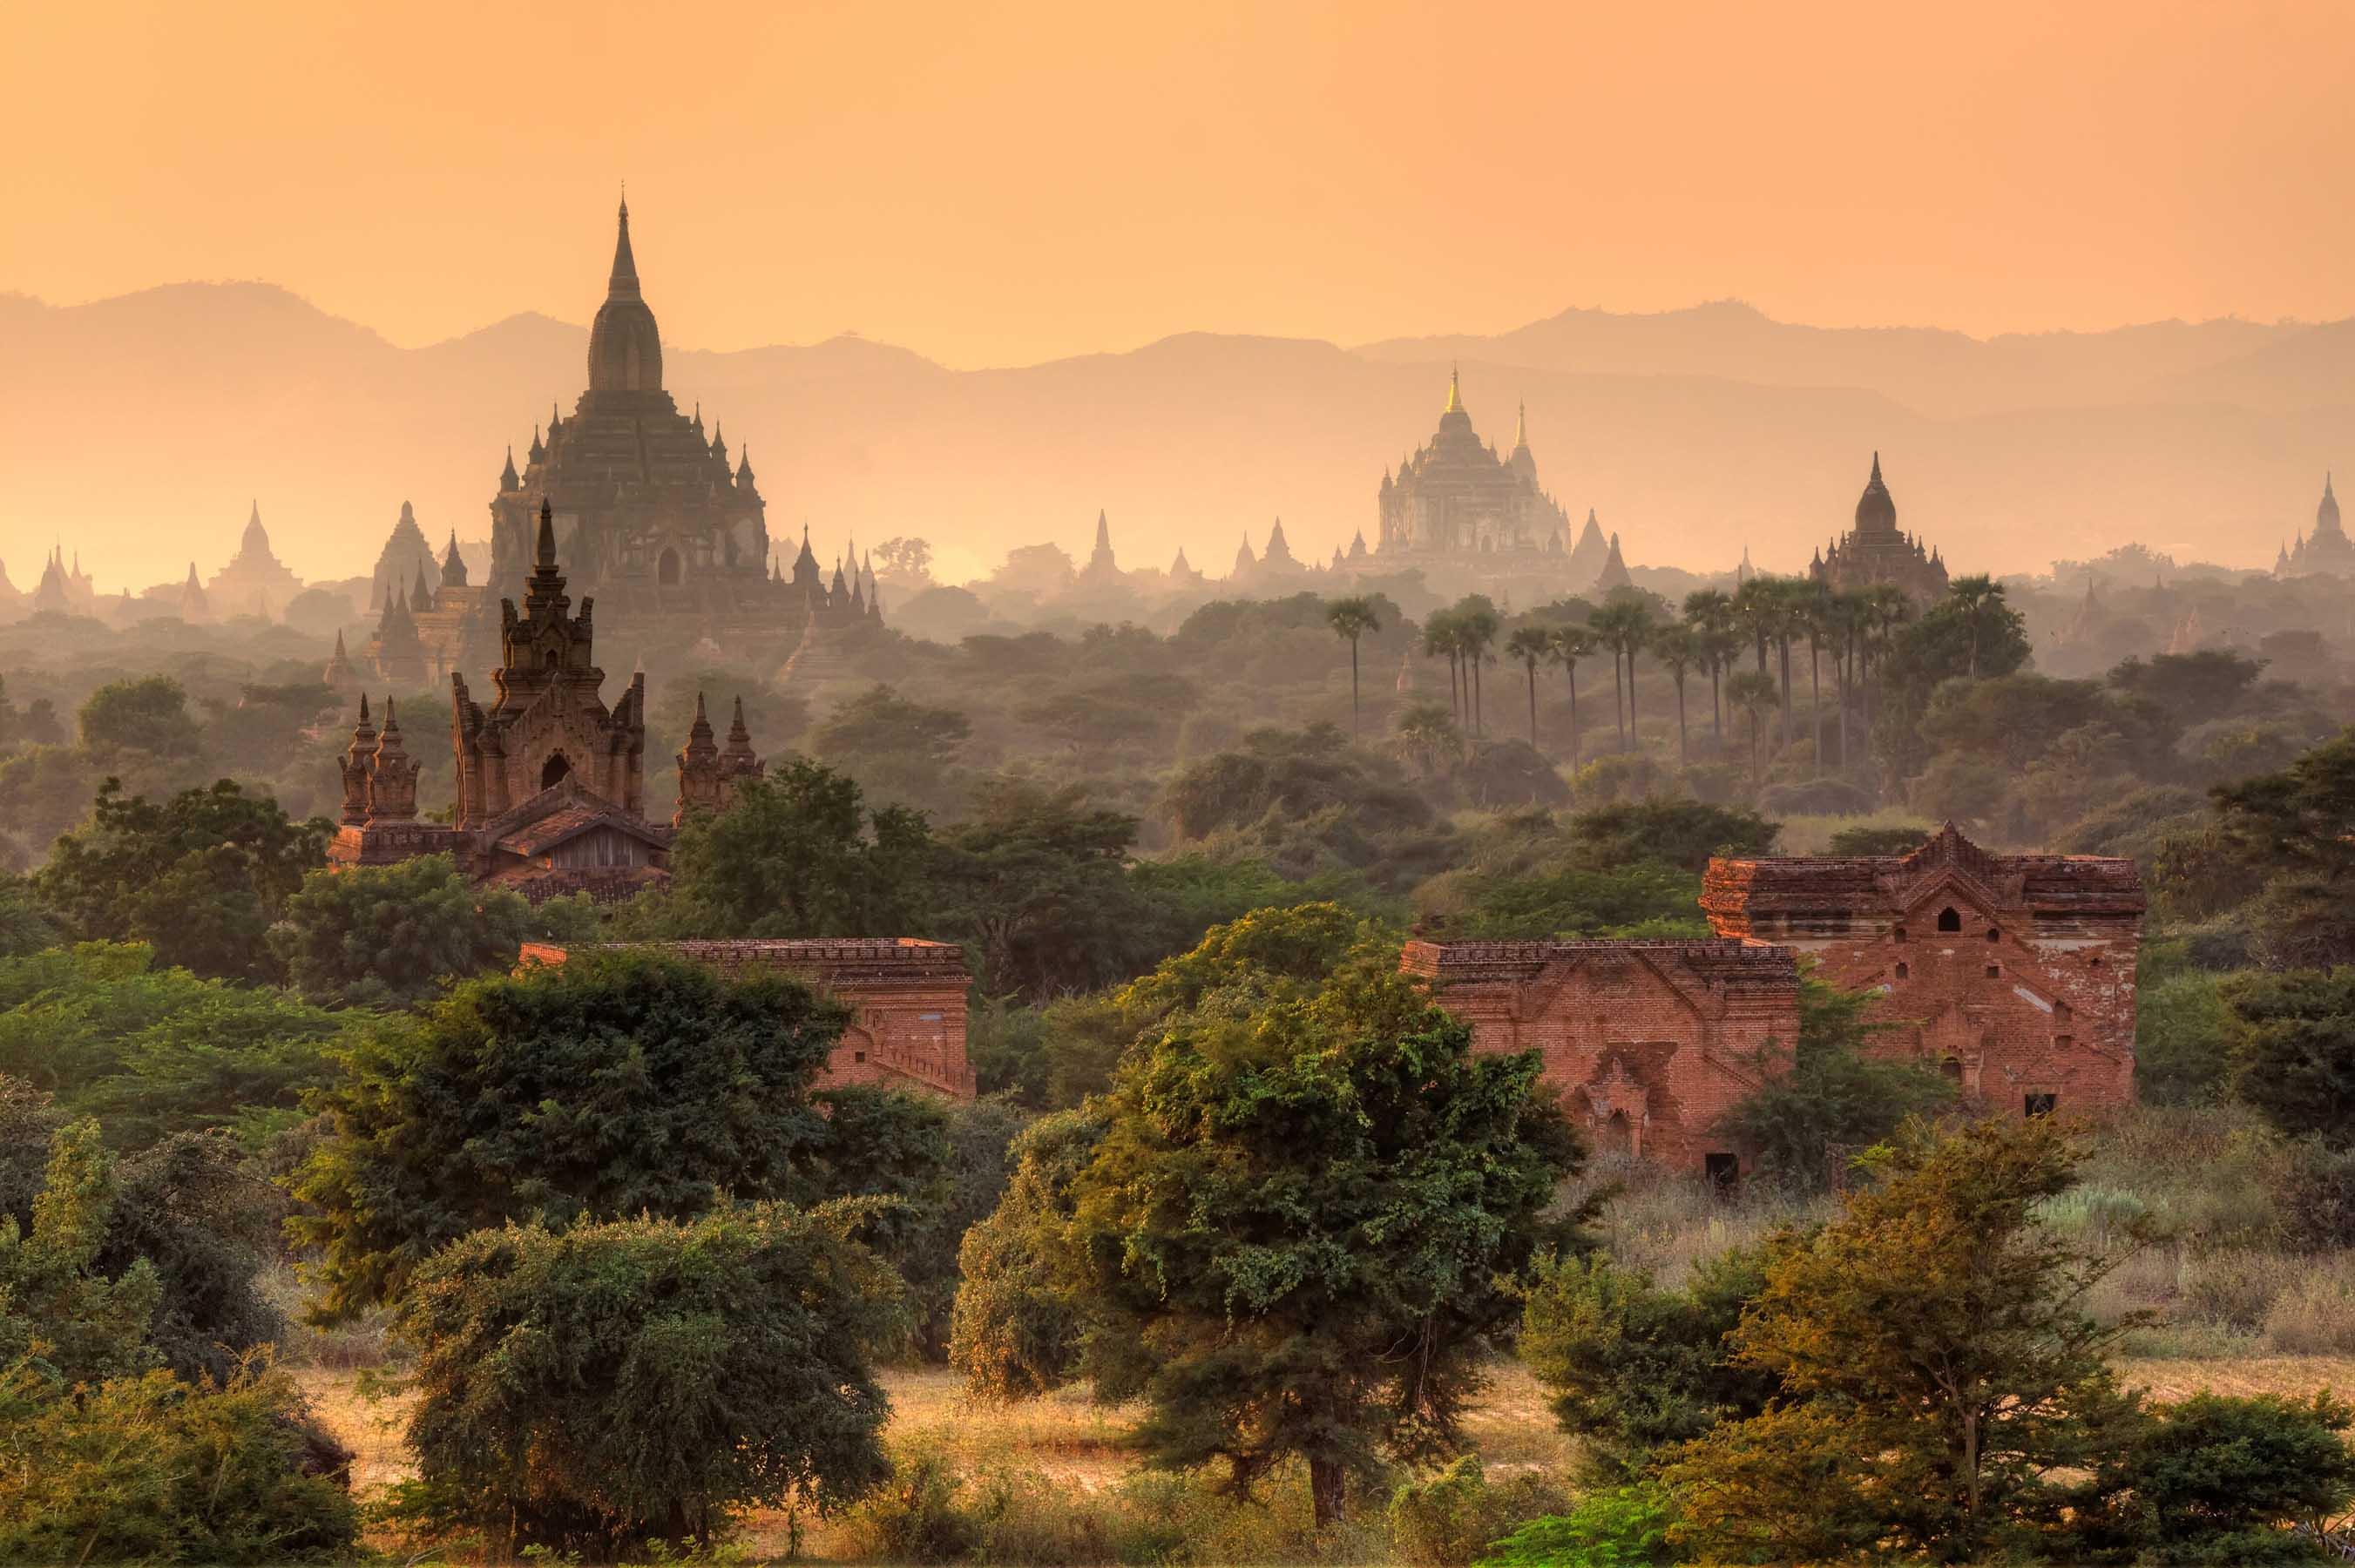 Indispensable destinations in Bagan, Myanmar